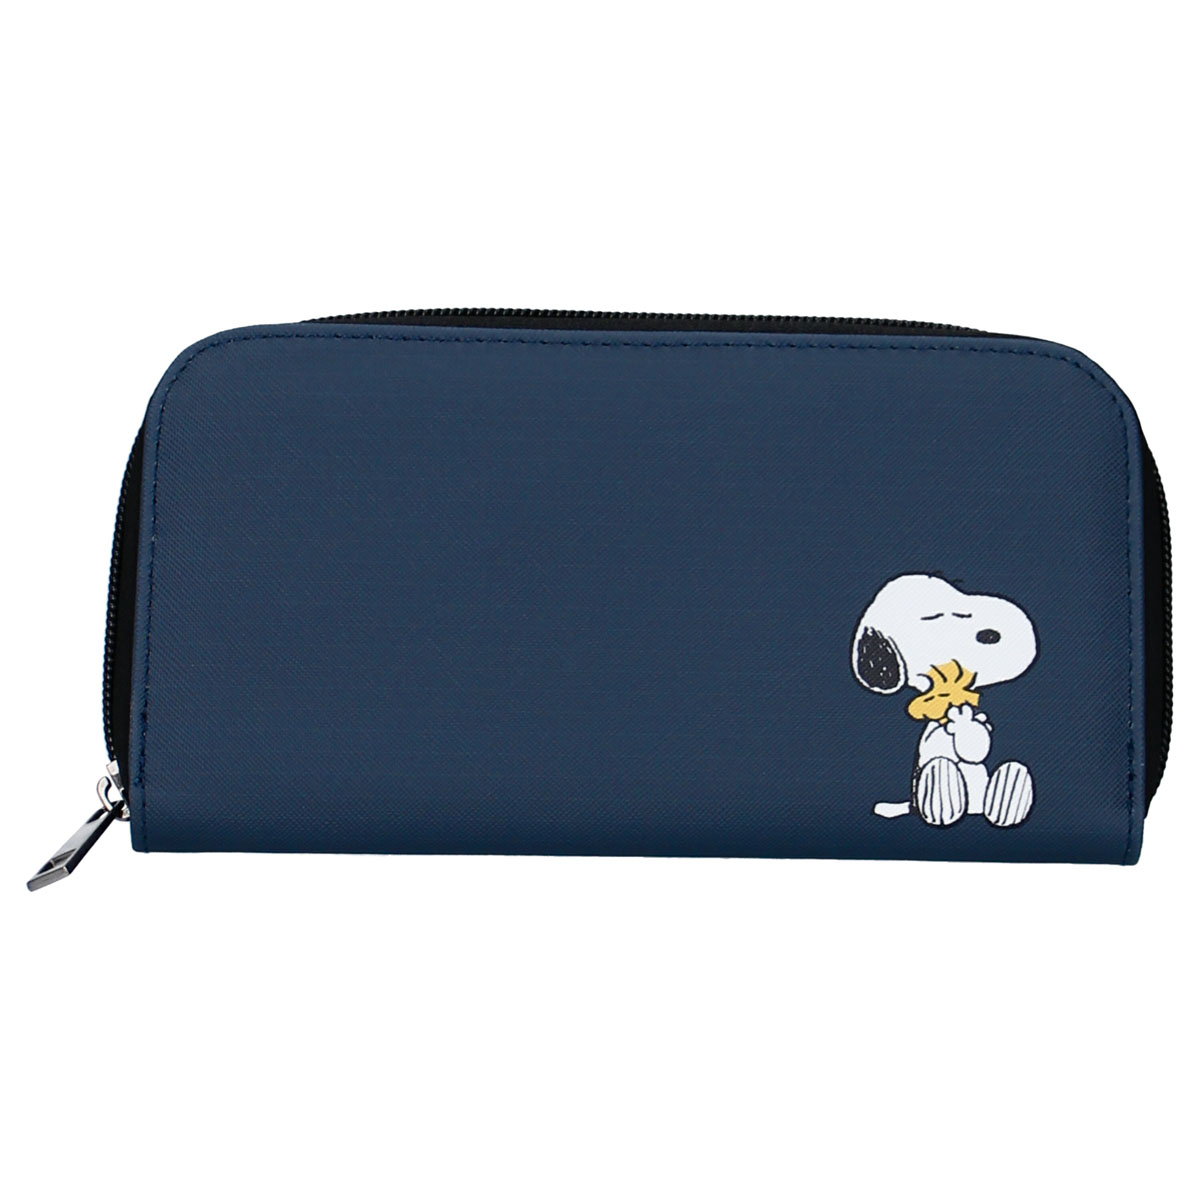 Grand porte-monnaie zippé \'Snoopy\' marine - 19x10x2 cm - [R0511]